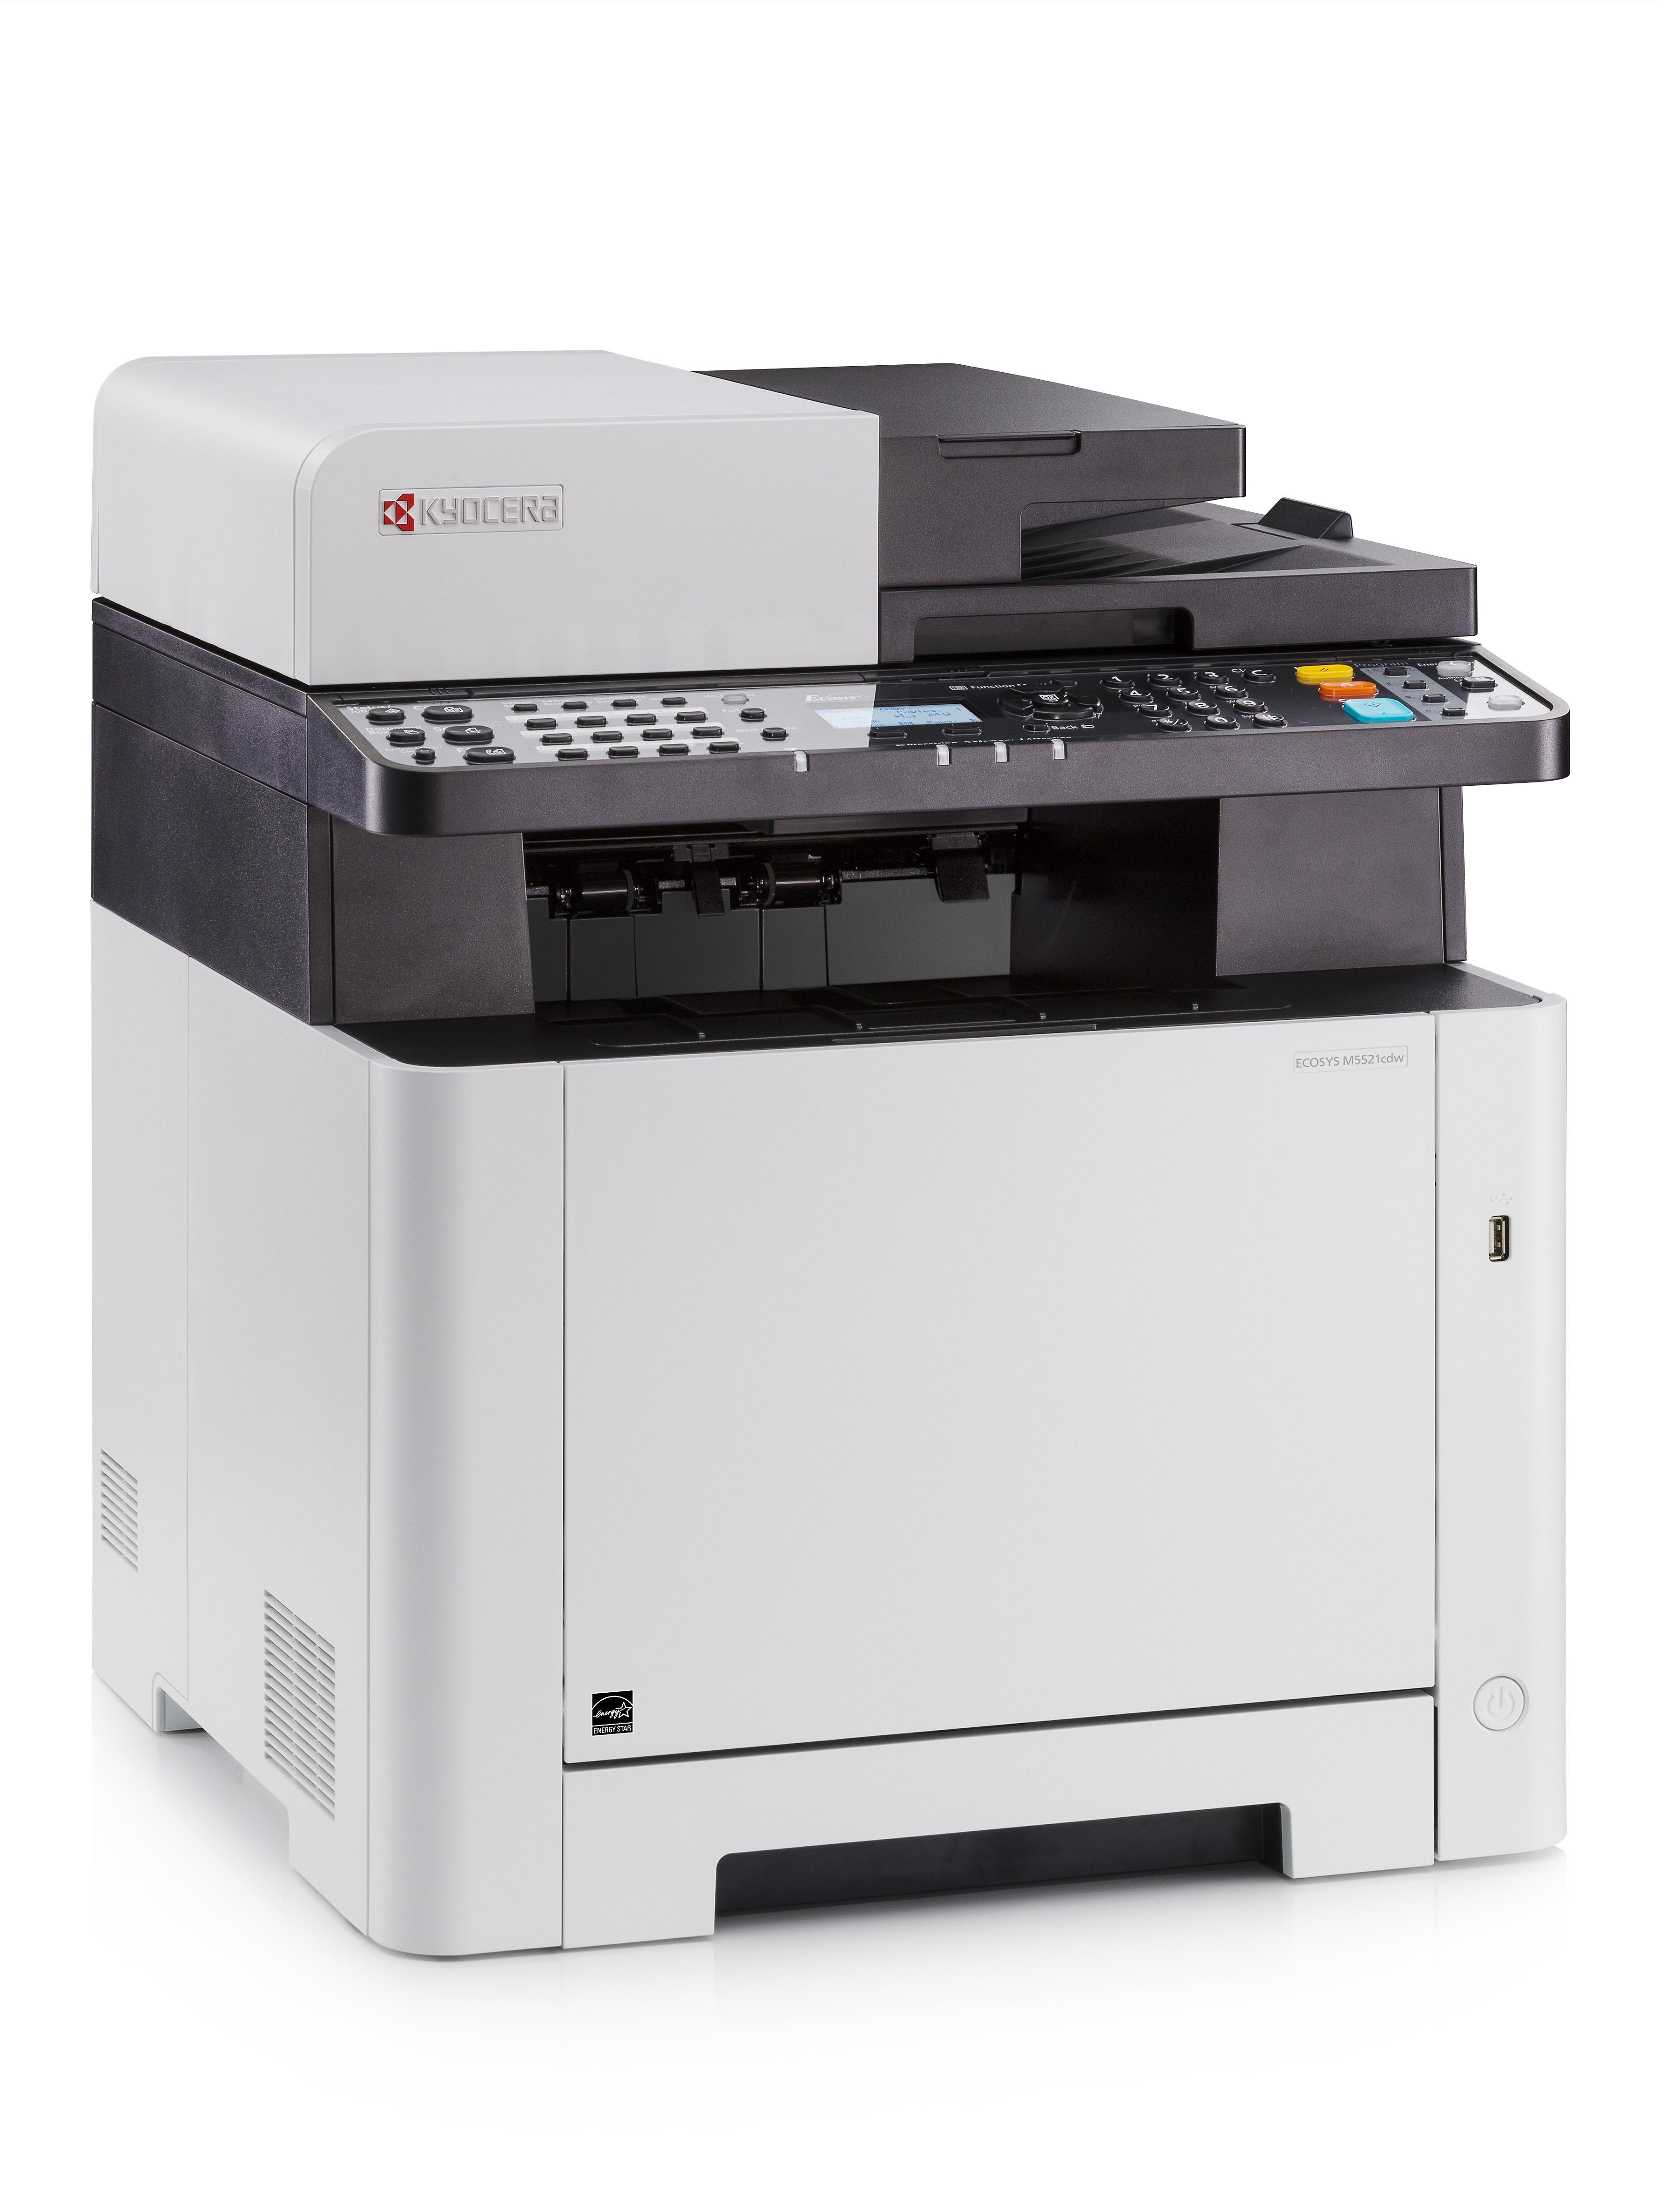 Kyocera, Ecosys, M5521CDW, A4, 21ppm, Colour, WiFi, Colour, Laser, MFP,